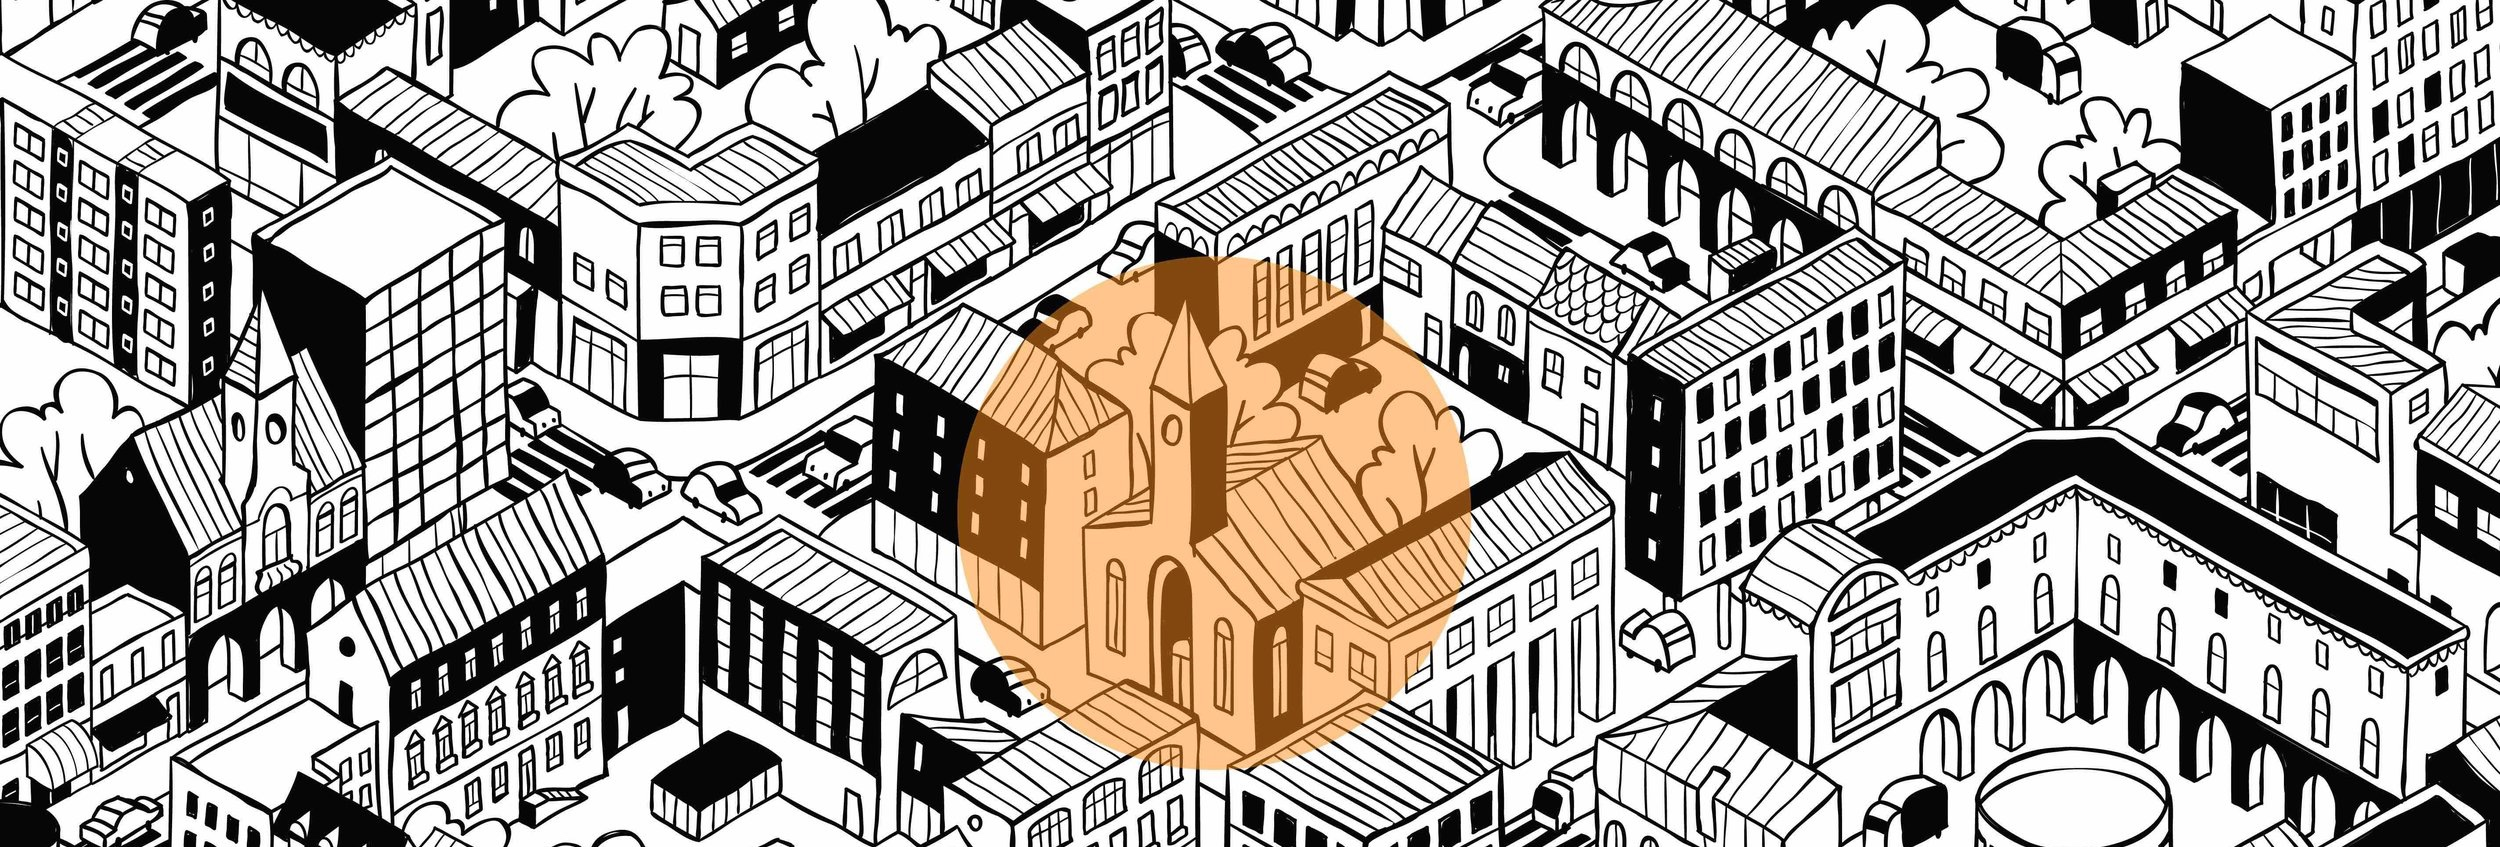 Cityscape01.jpg